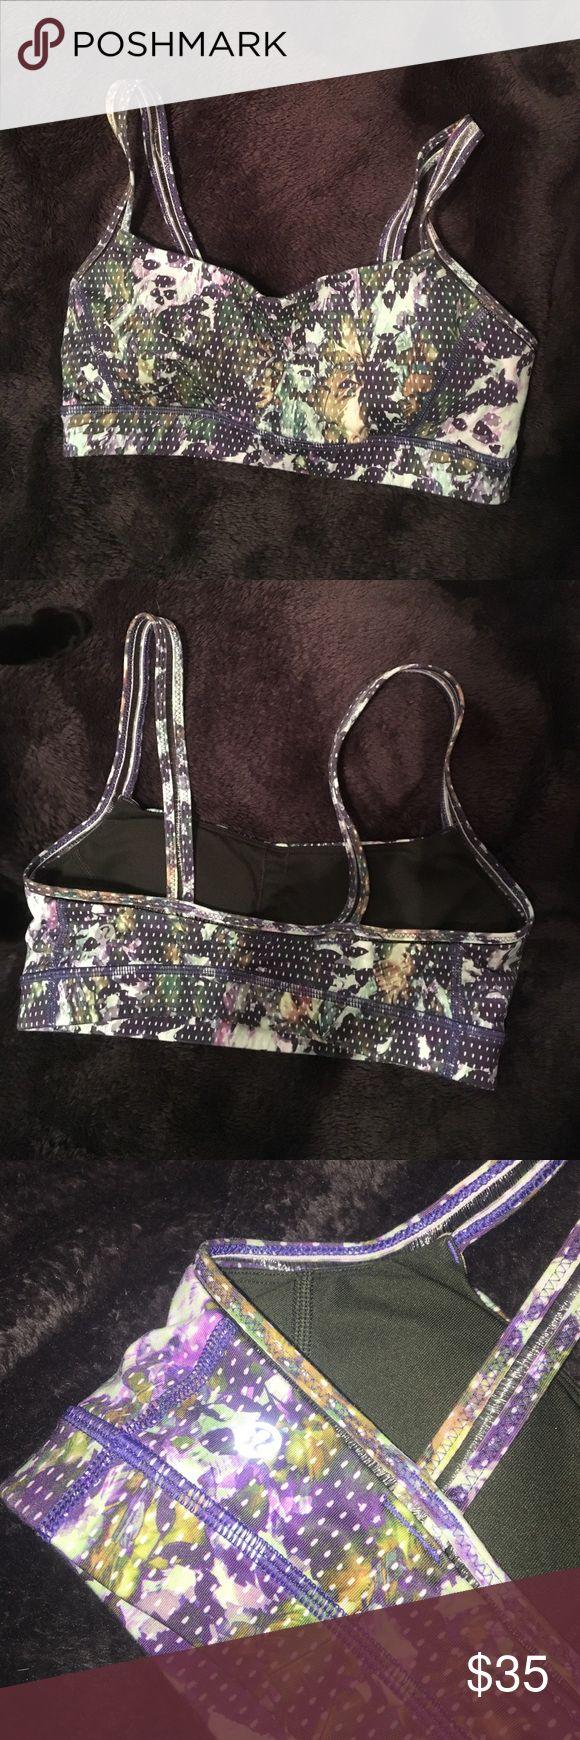 Lululemon sports bra Authentic Lulu Leaf pattern sports bra with cups inside lululemon athletica Intimates & Sleepwear Bras